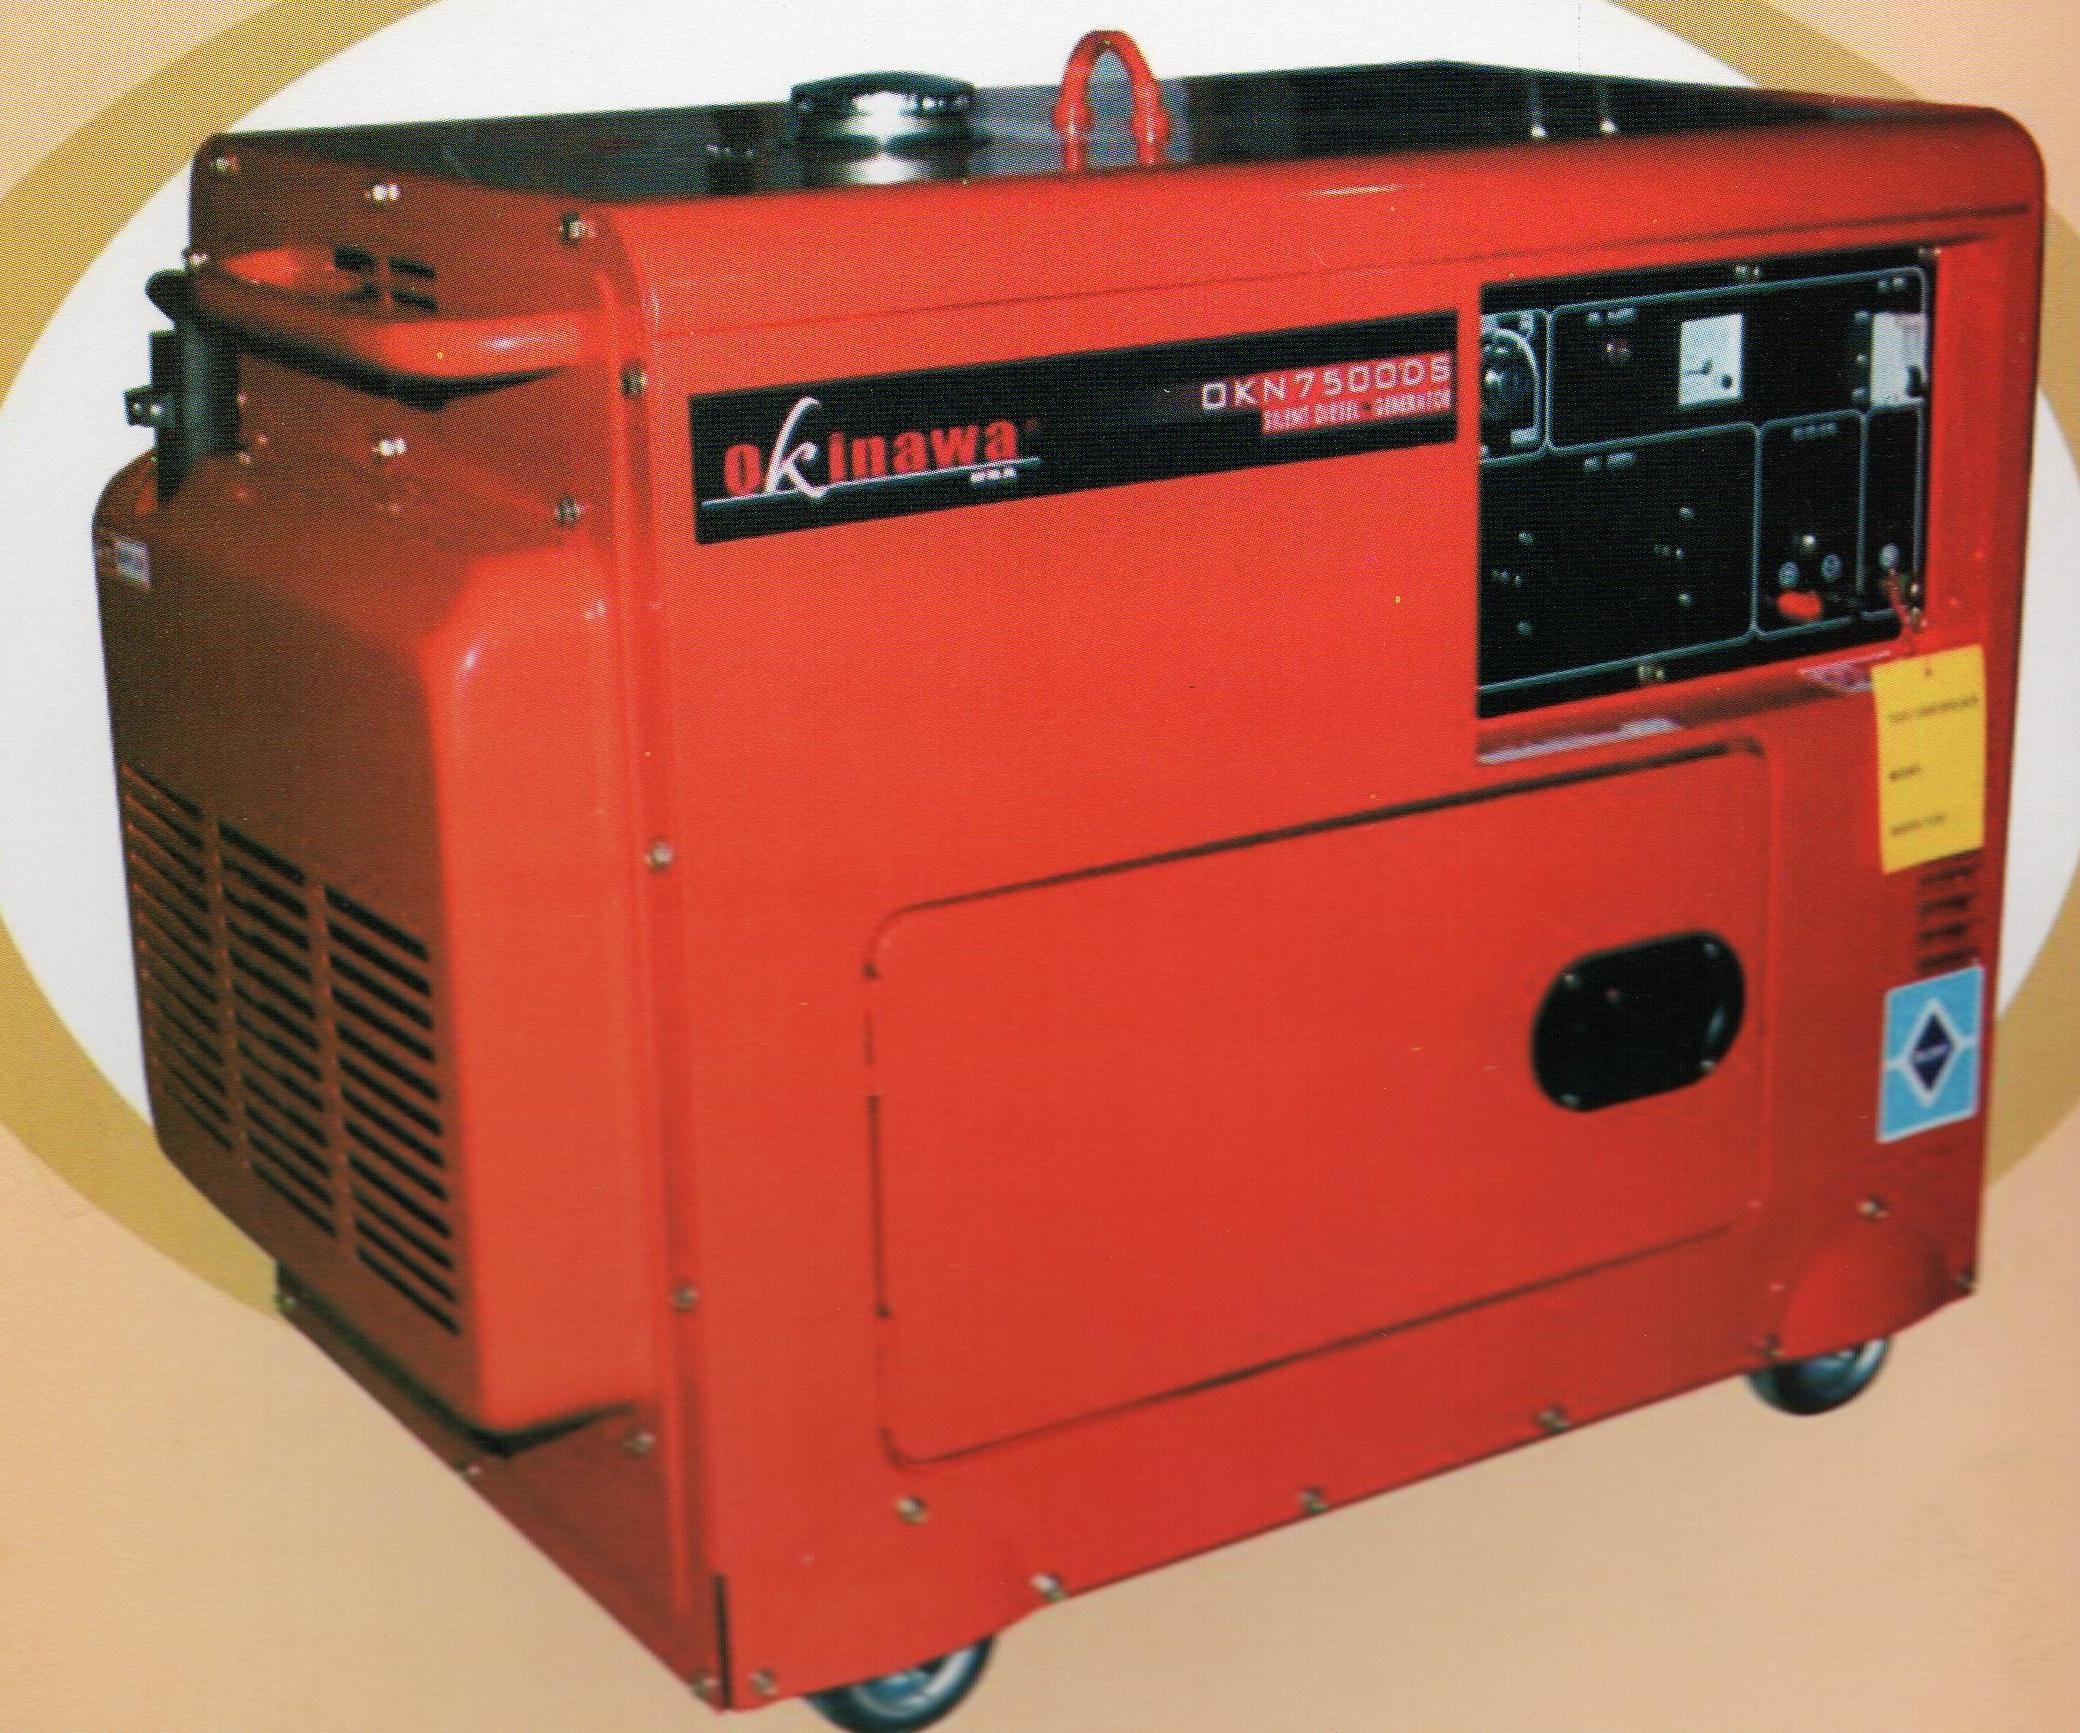 Jual Okinawa Silent Generator Diesel OKN 7500